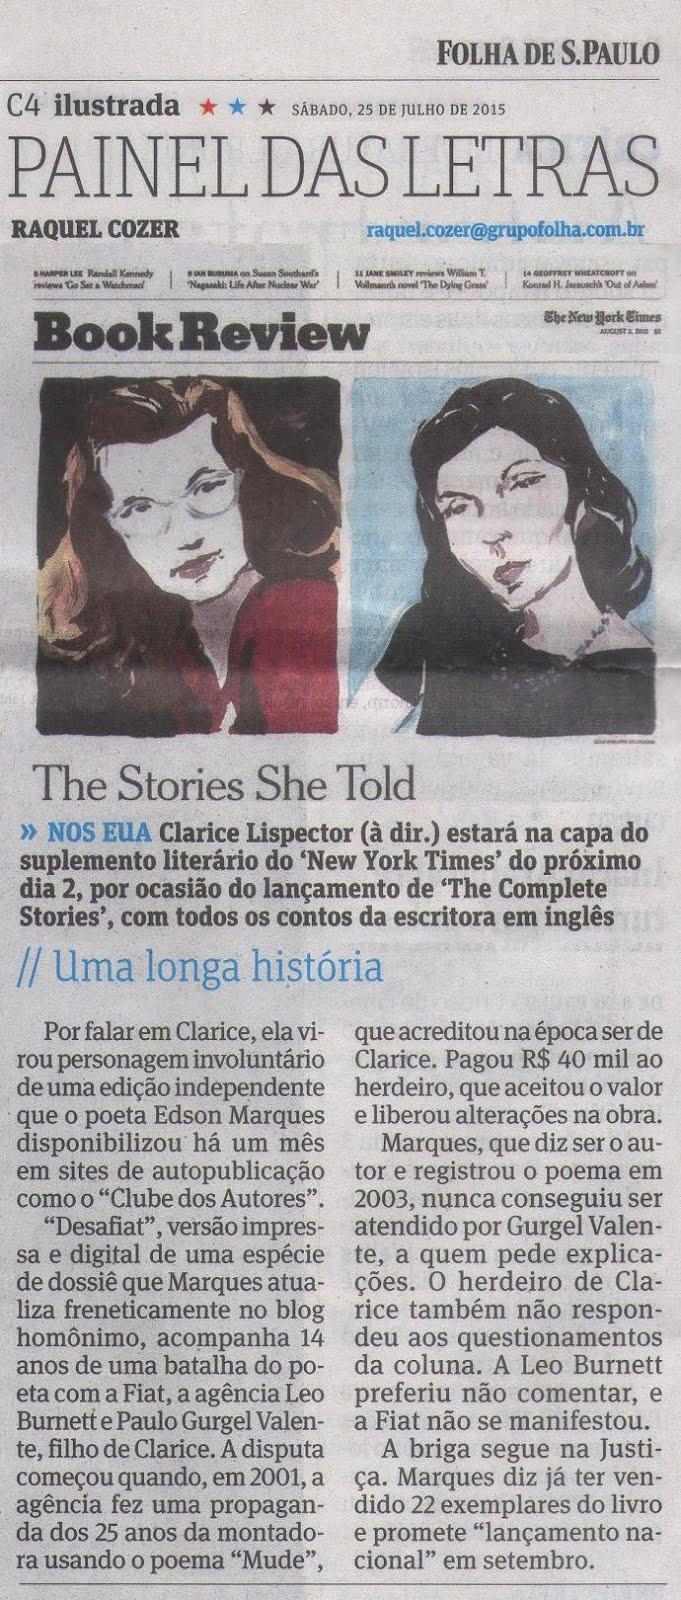 Folha de S. Paulo - 25 de Julho de 2015